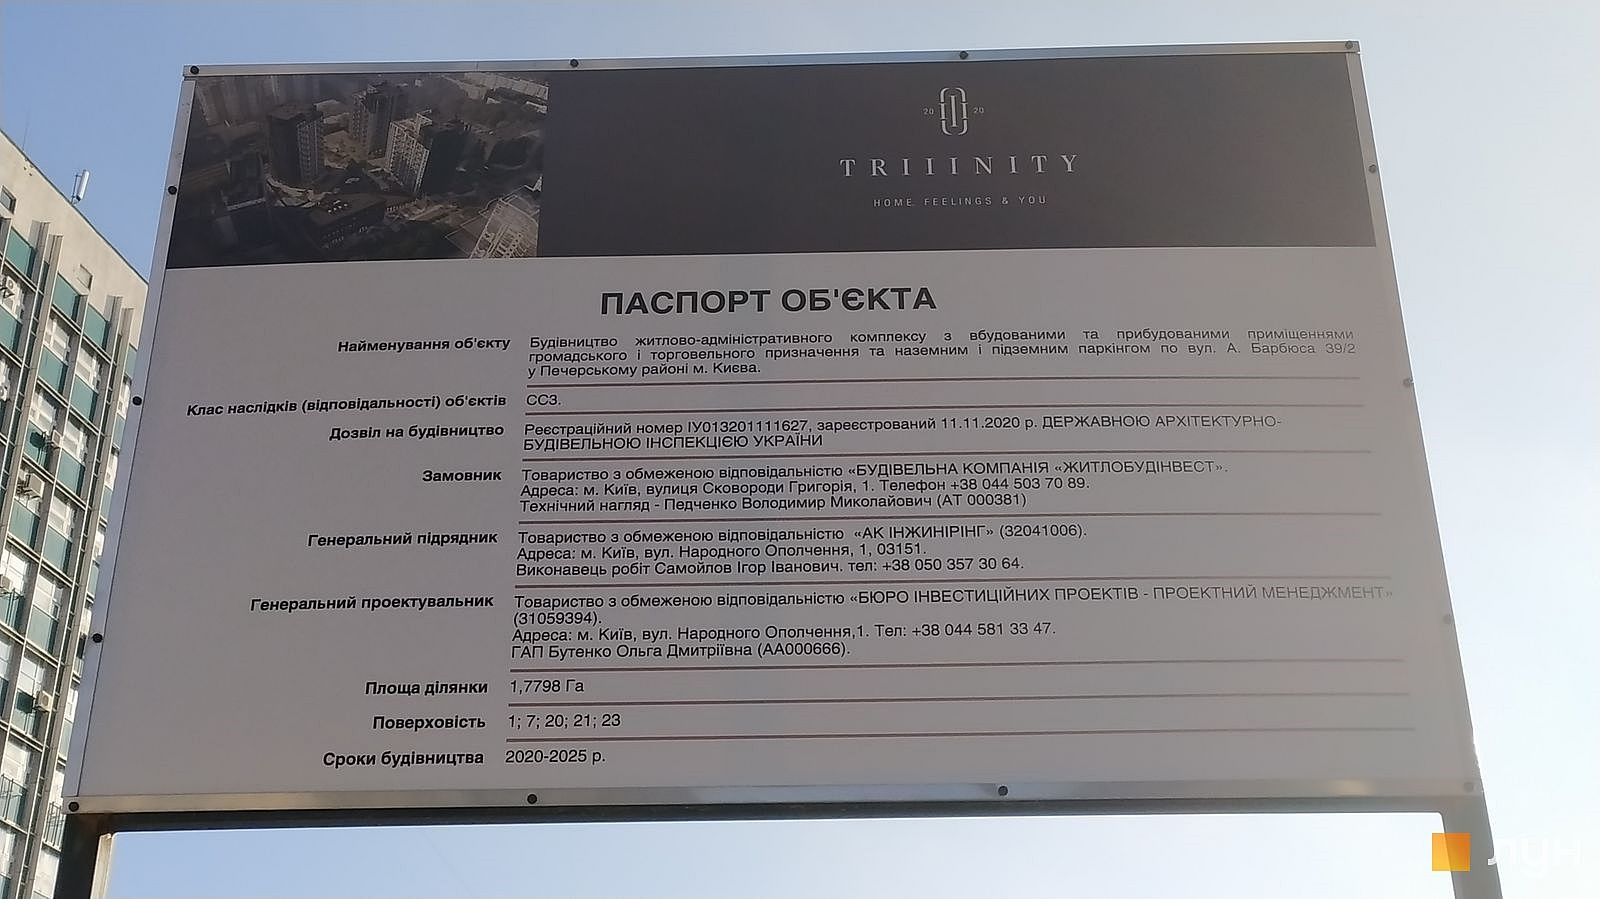 ЖК TRIIINITY паспорт объекта